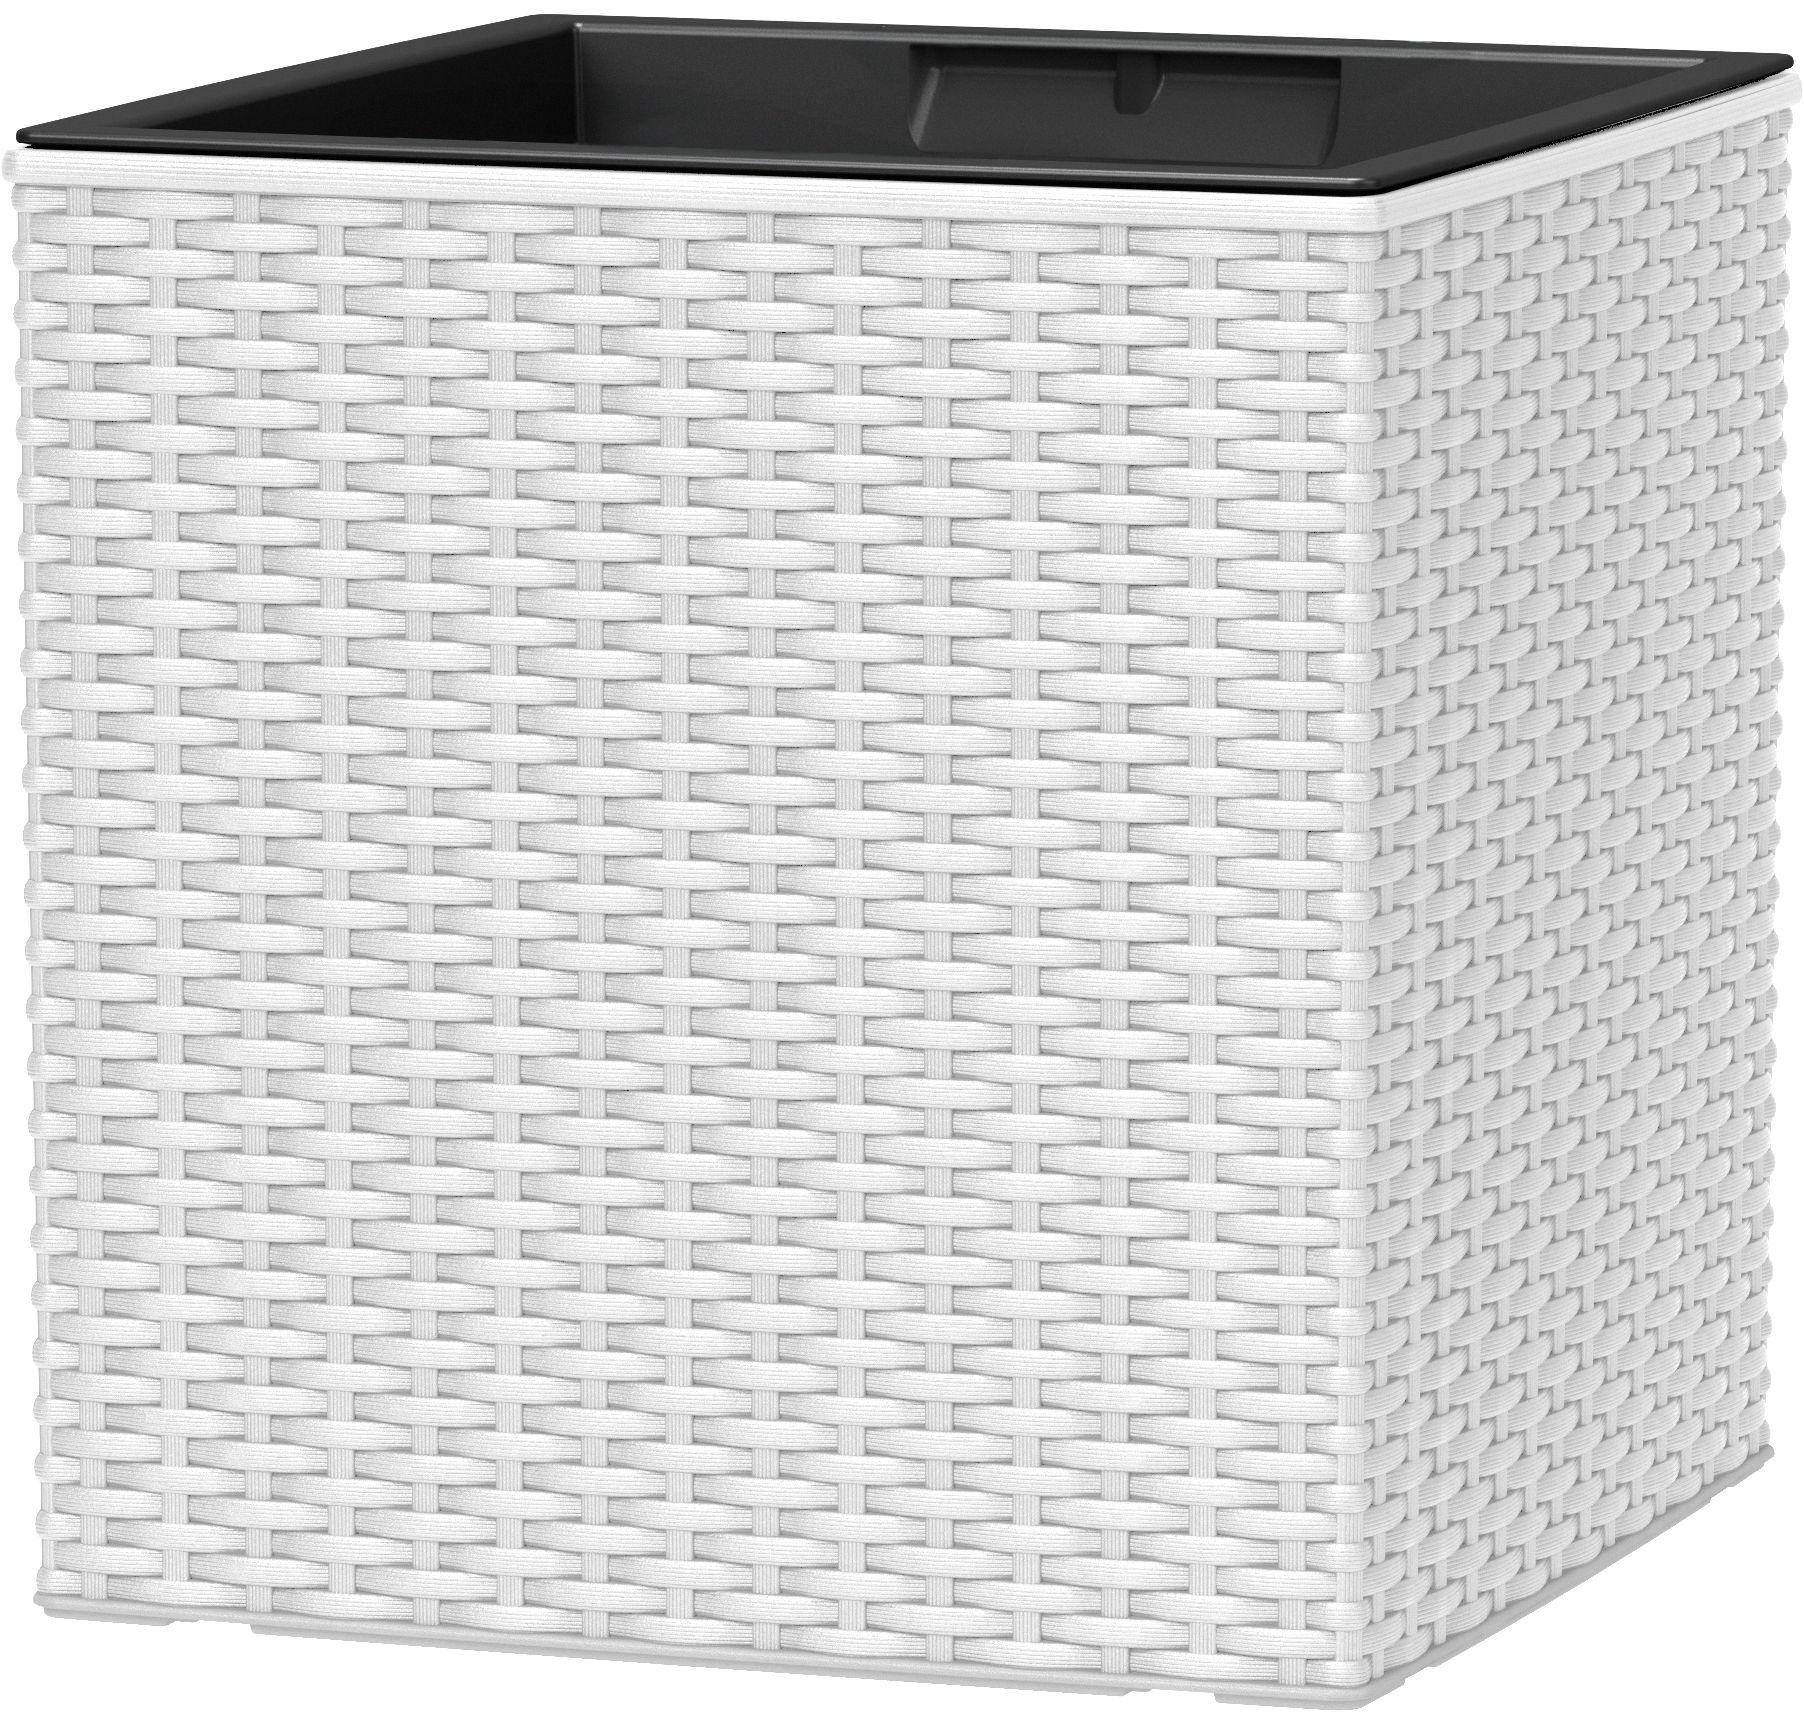 EMSA Blumenkasten »CASA MESH Würfel«, BxTxH: 30x30x31cm, weiß